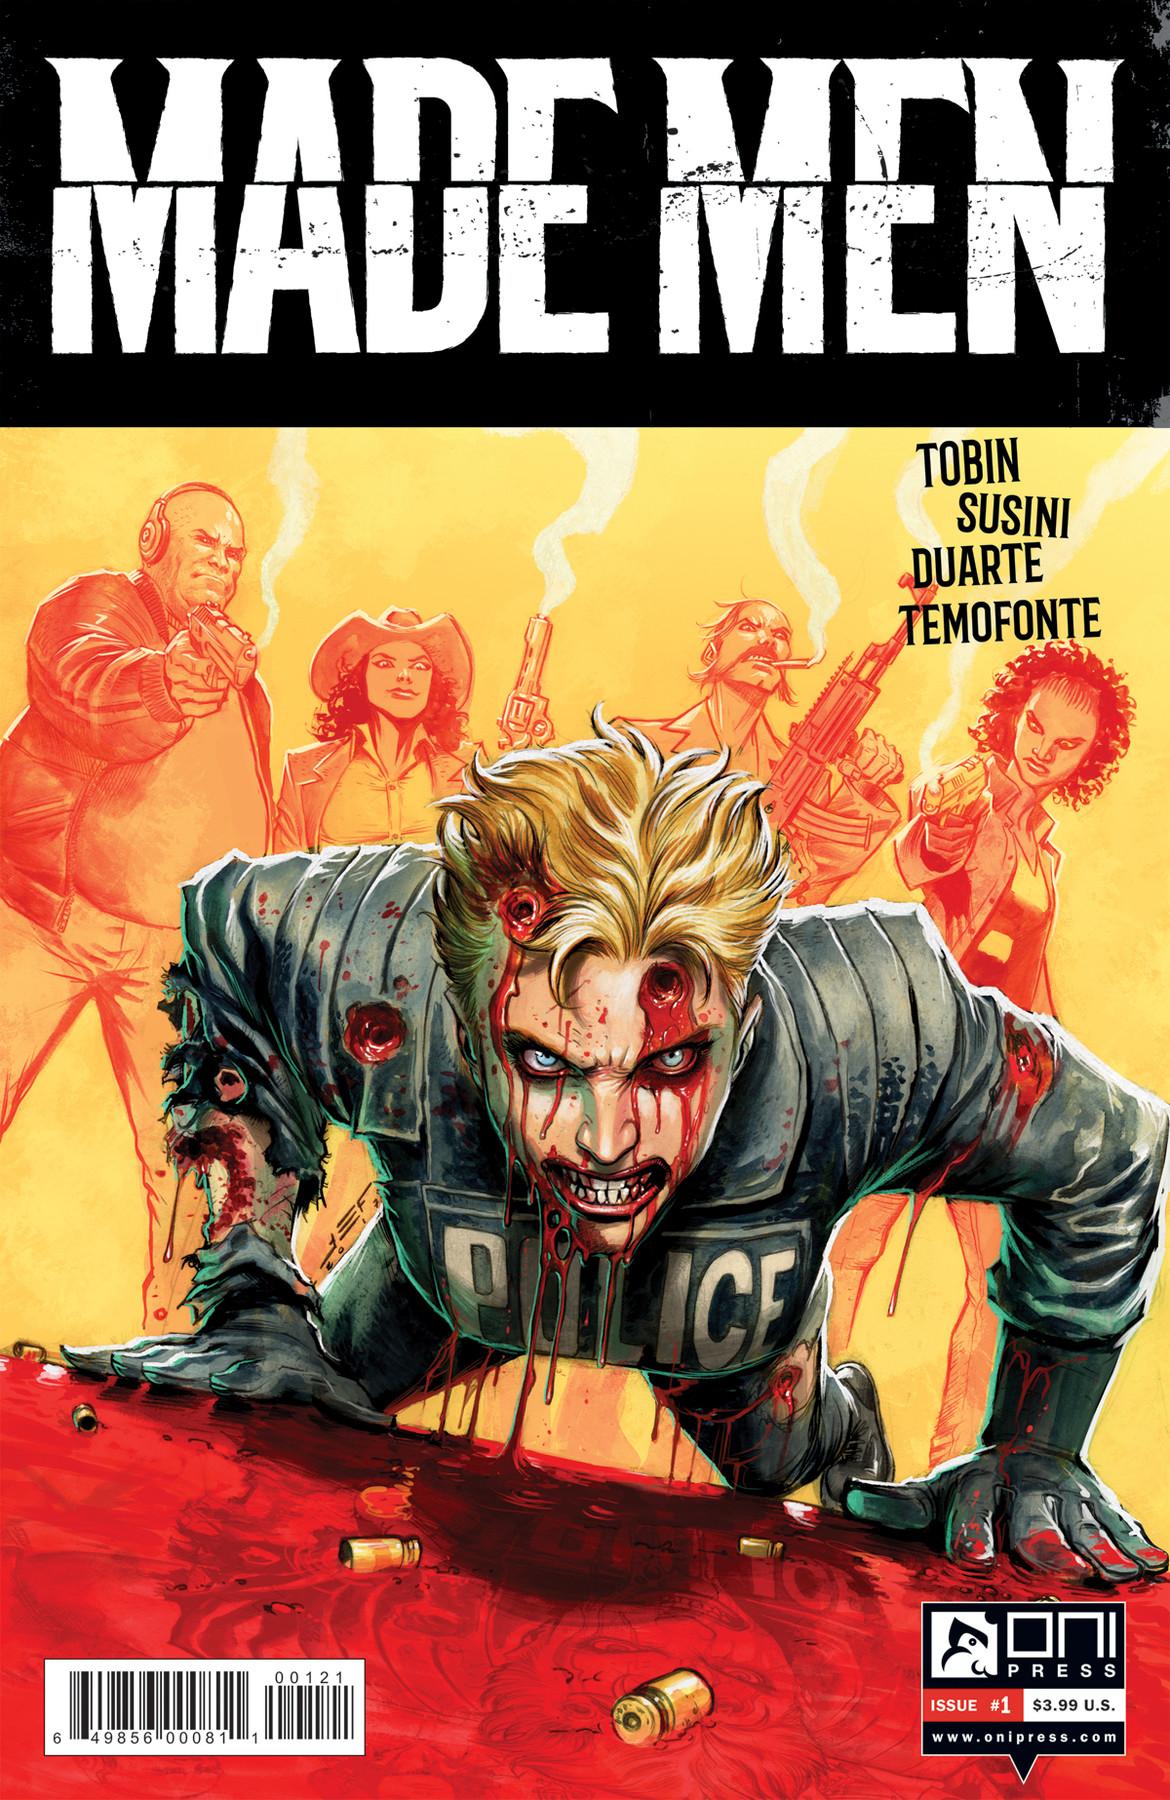 MADEMEN #1 - 4x6 FERREYRA COVER B SOLICIT WEB.jpg